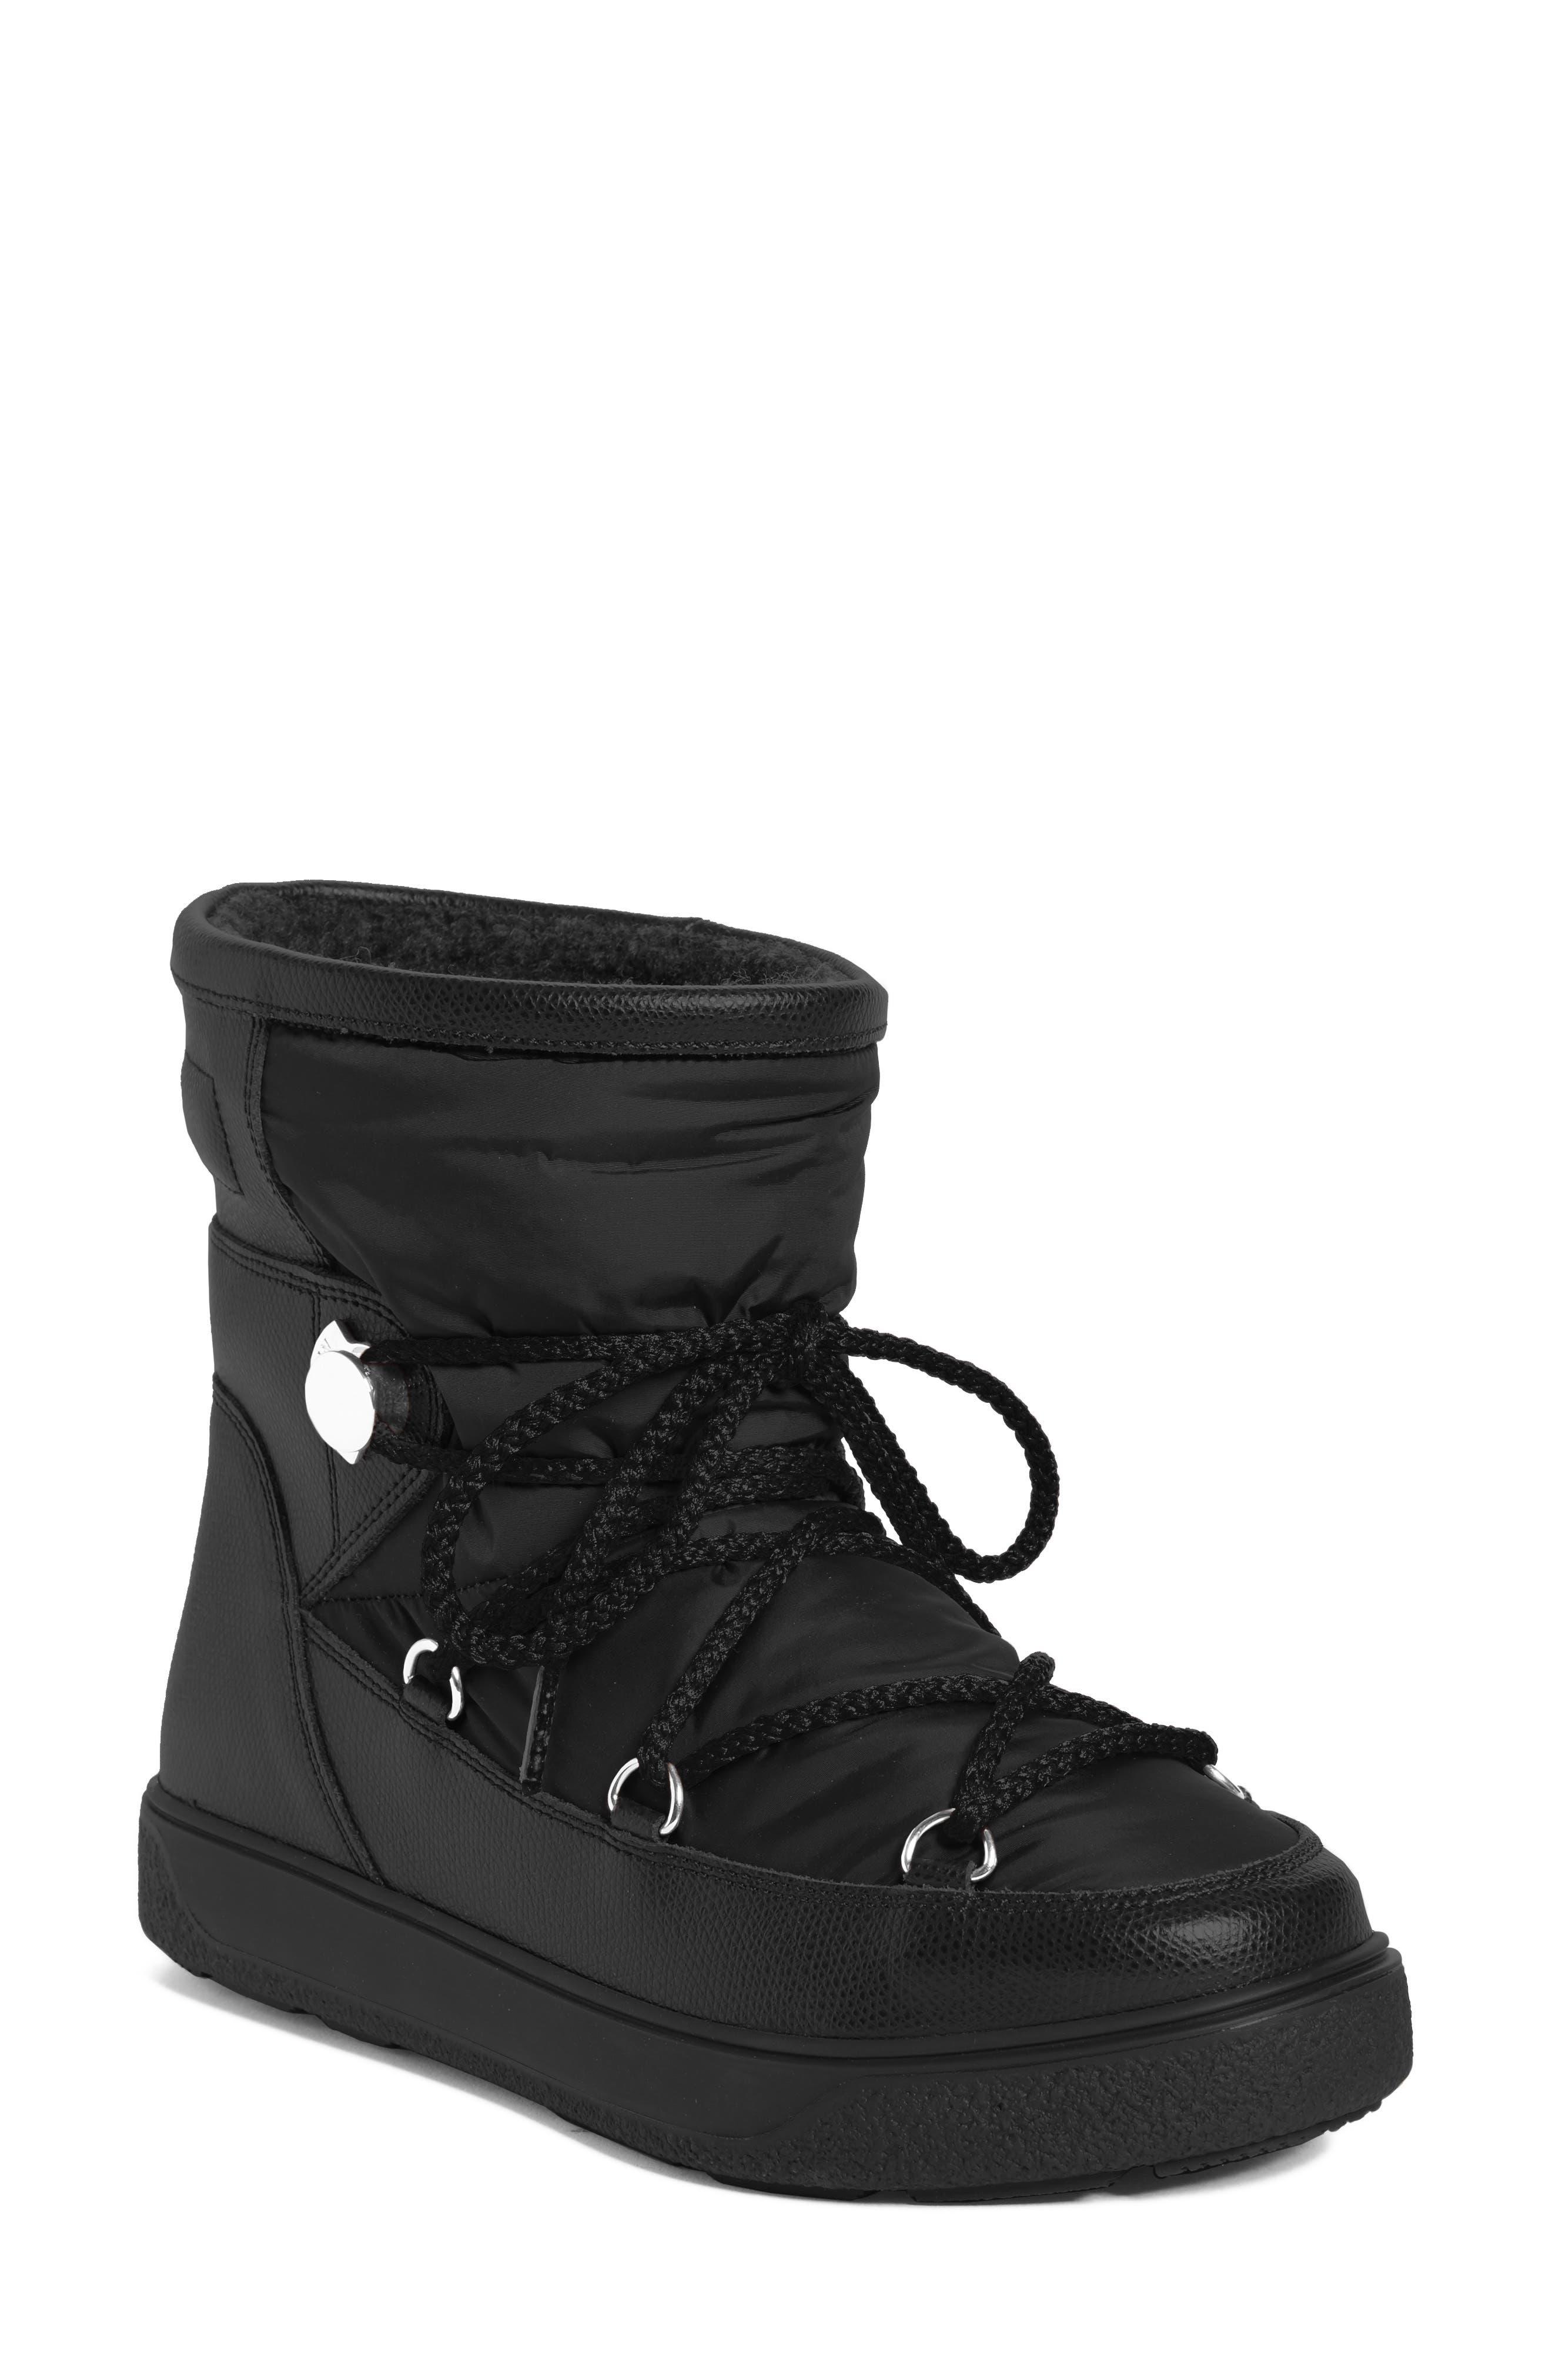 Moncler New Fanny Stivale Short Moon Boots (Women)